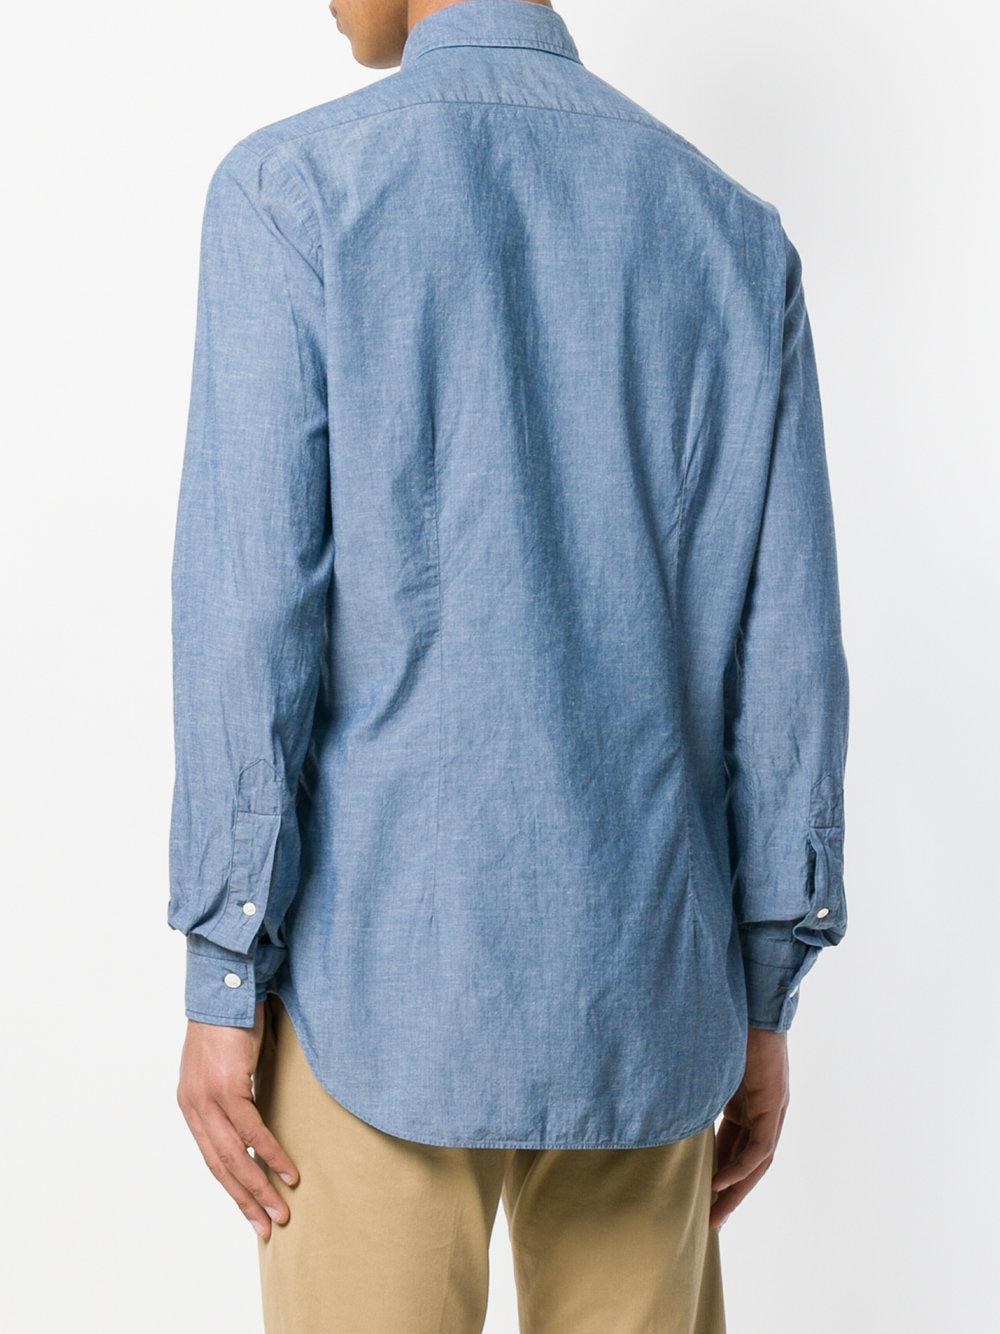 Bagutta Linen Classic Shirt in Blue for Men